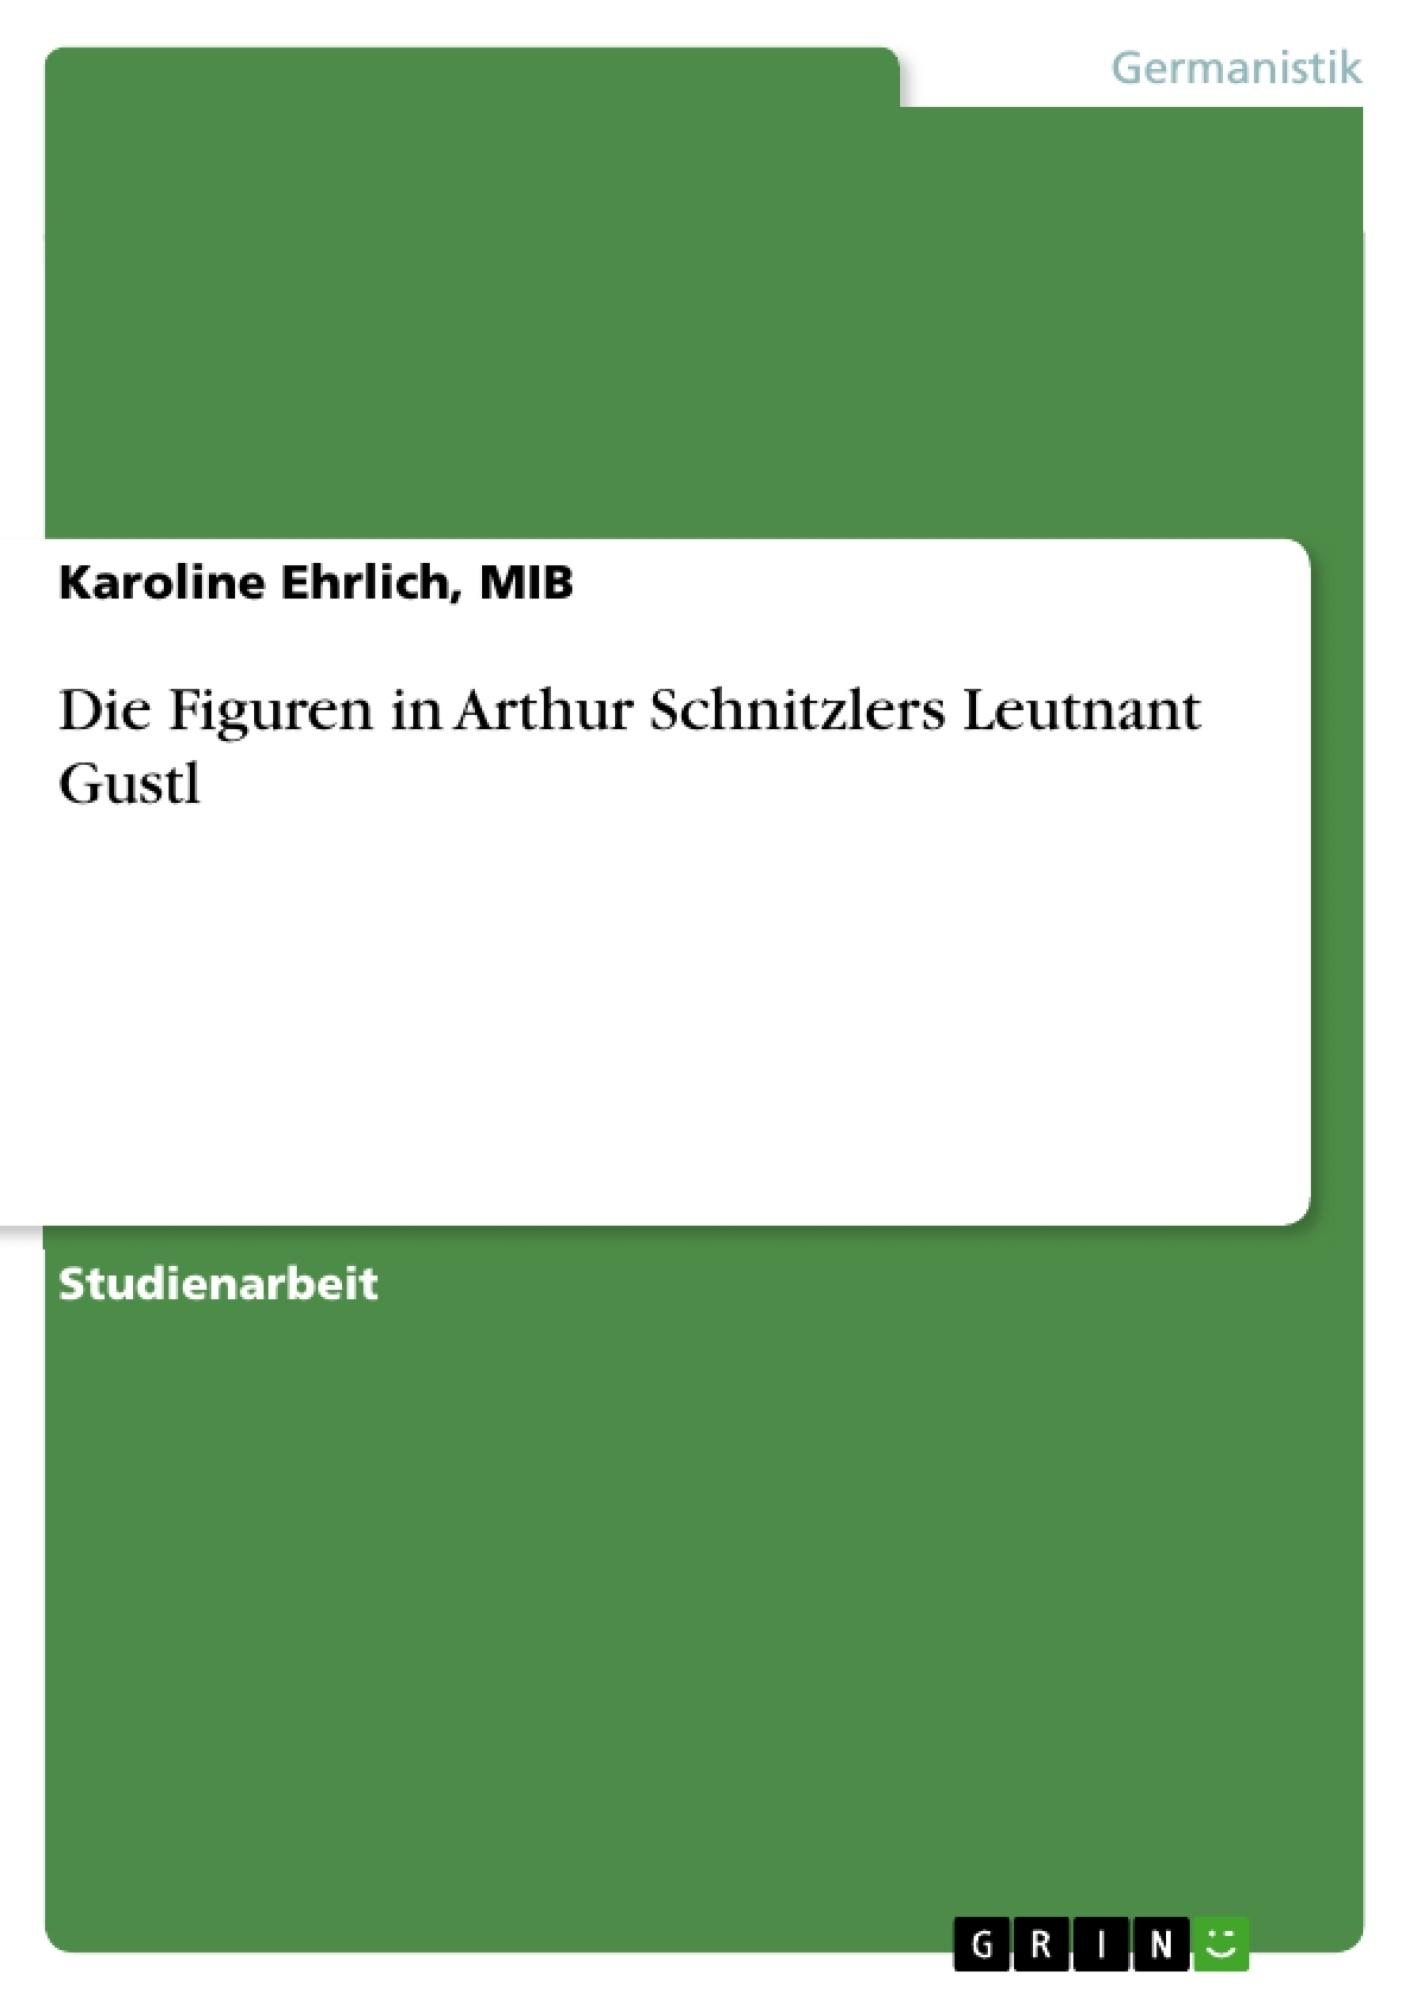 Titel: Die Figuren in Arthur Schnitzlers Leutnant Gustl